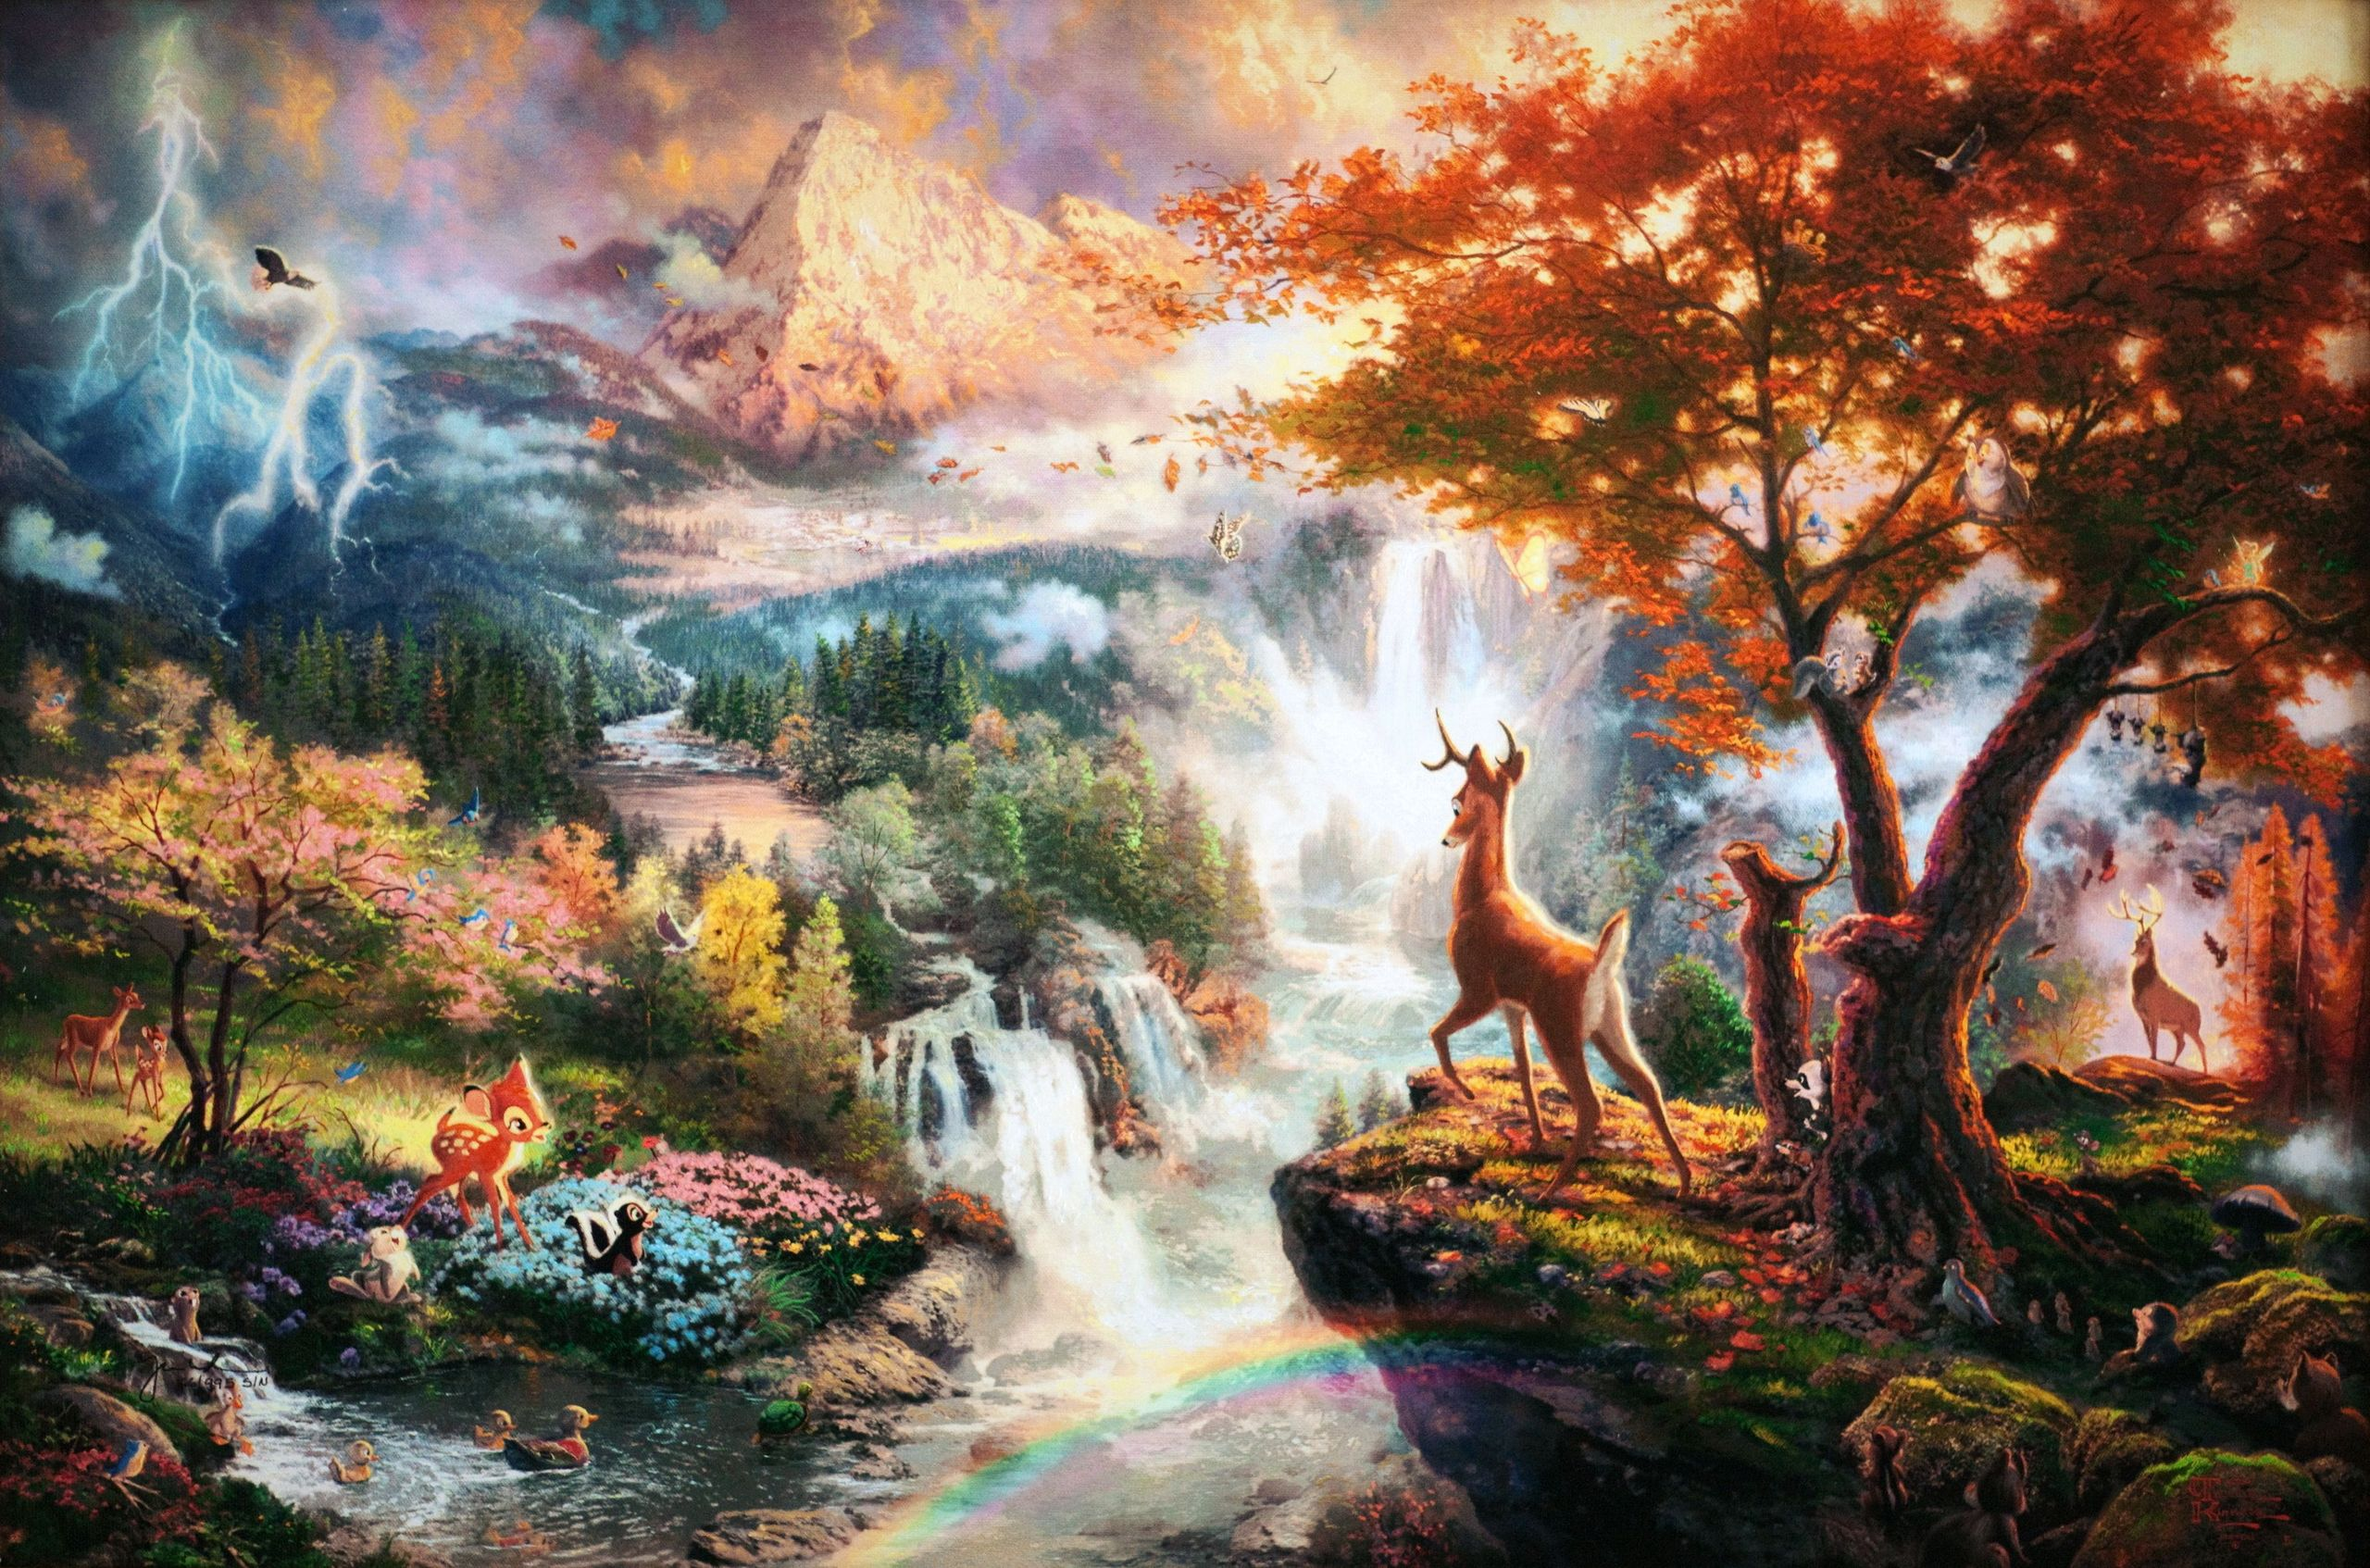 Walt Disney Wallpapers Bambi walt disney characters 28821938 2560 1694 2560x1694